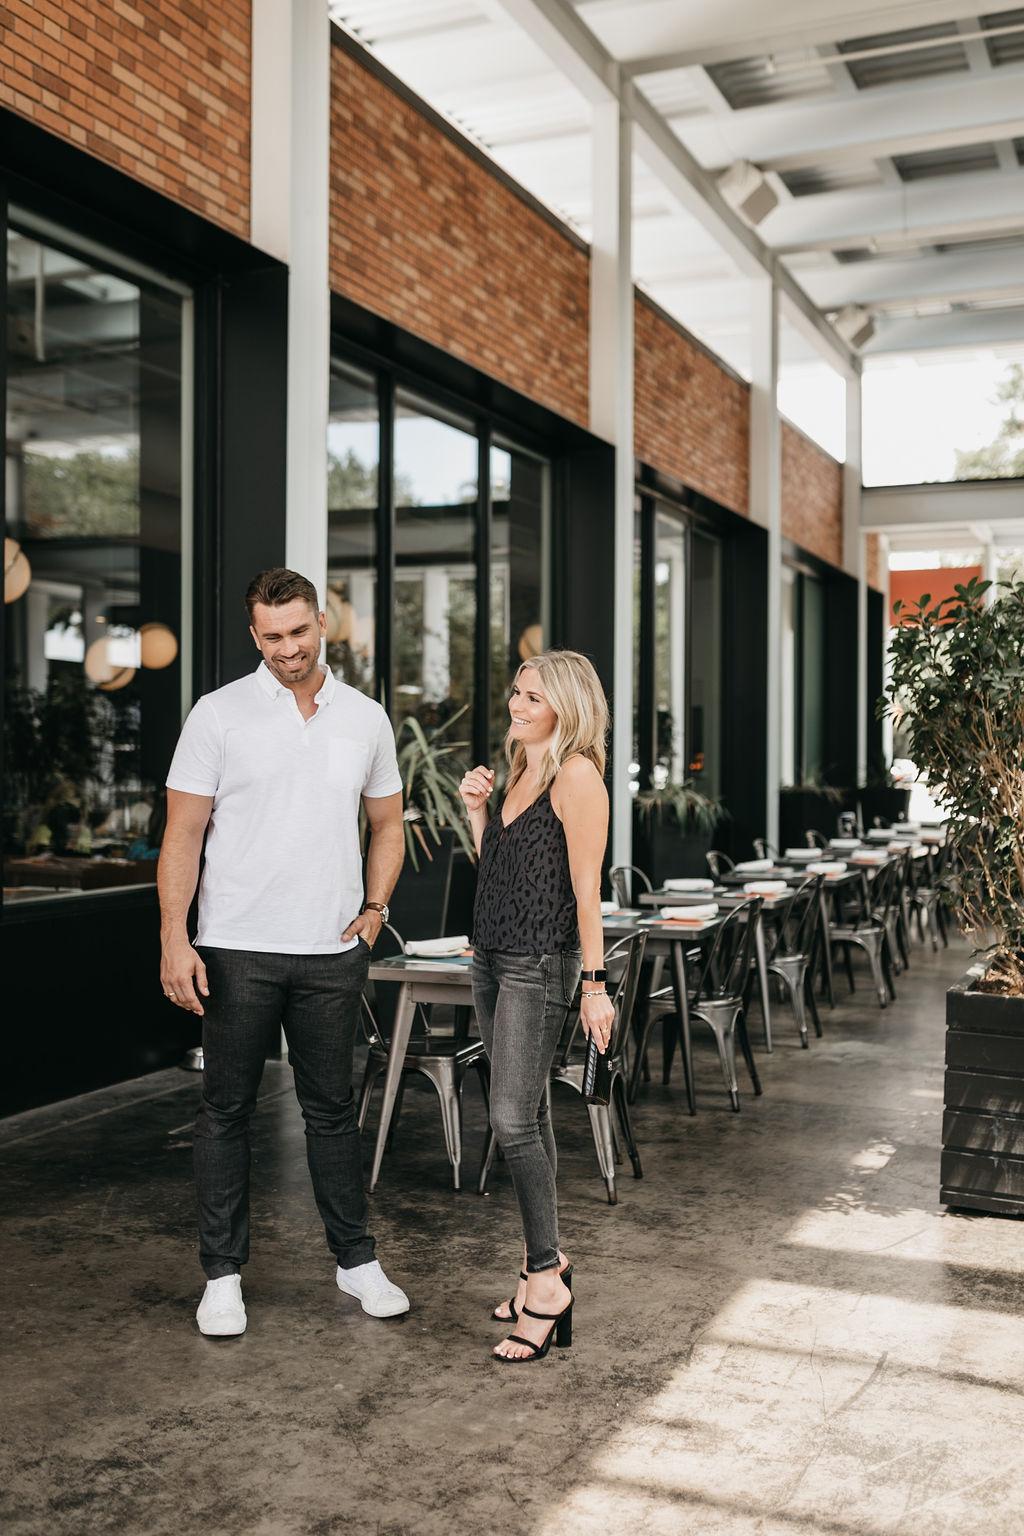 sharing dating app advice